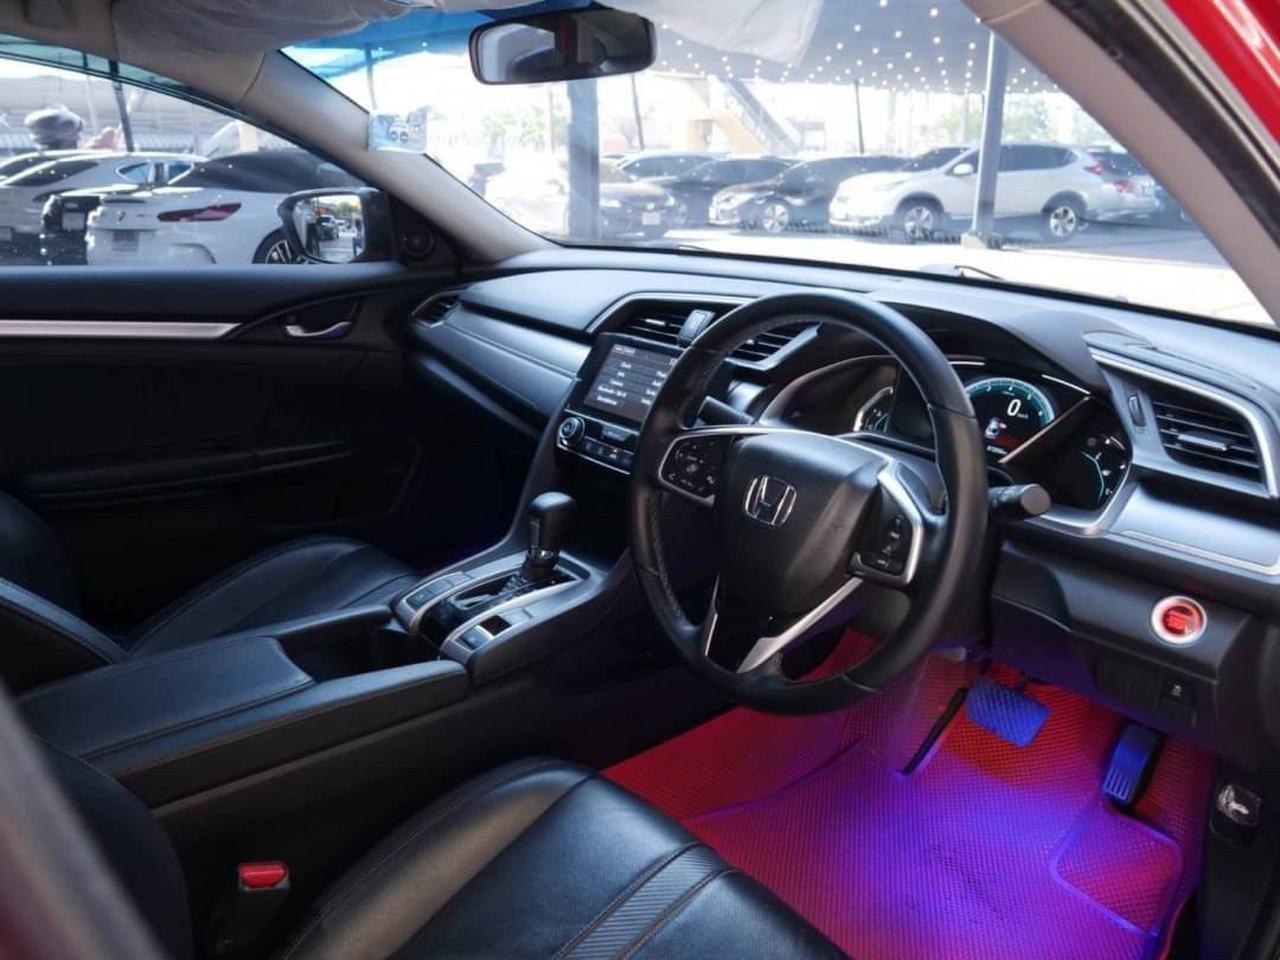 86 Honda Civic FC 1.8 EL Top 2018 Auto สีแดง รูปที่ 1